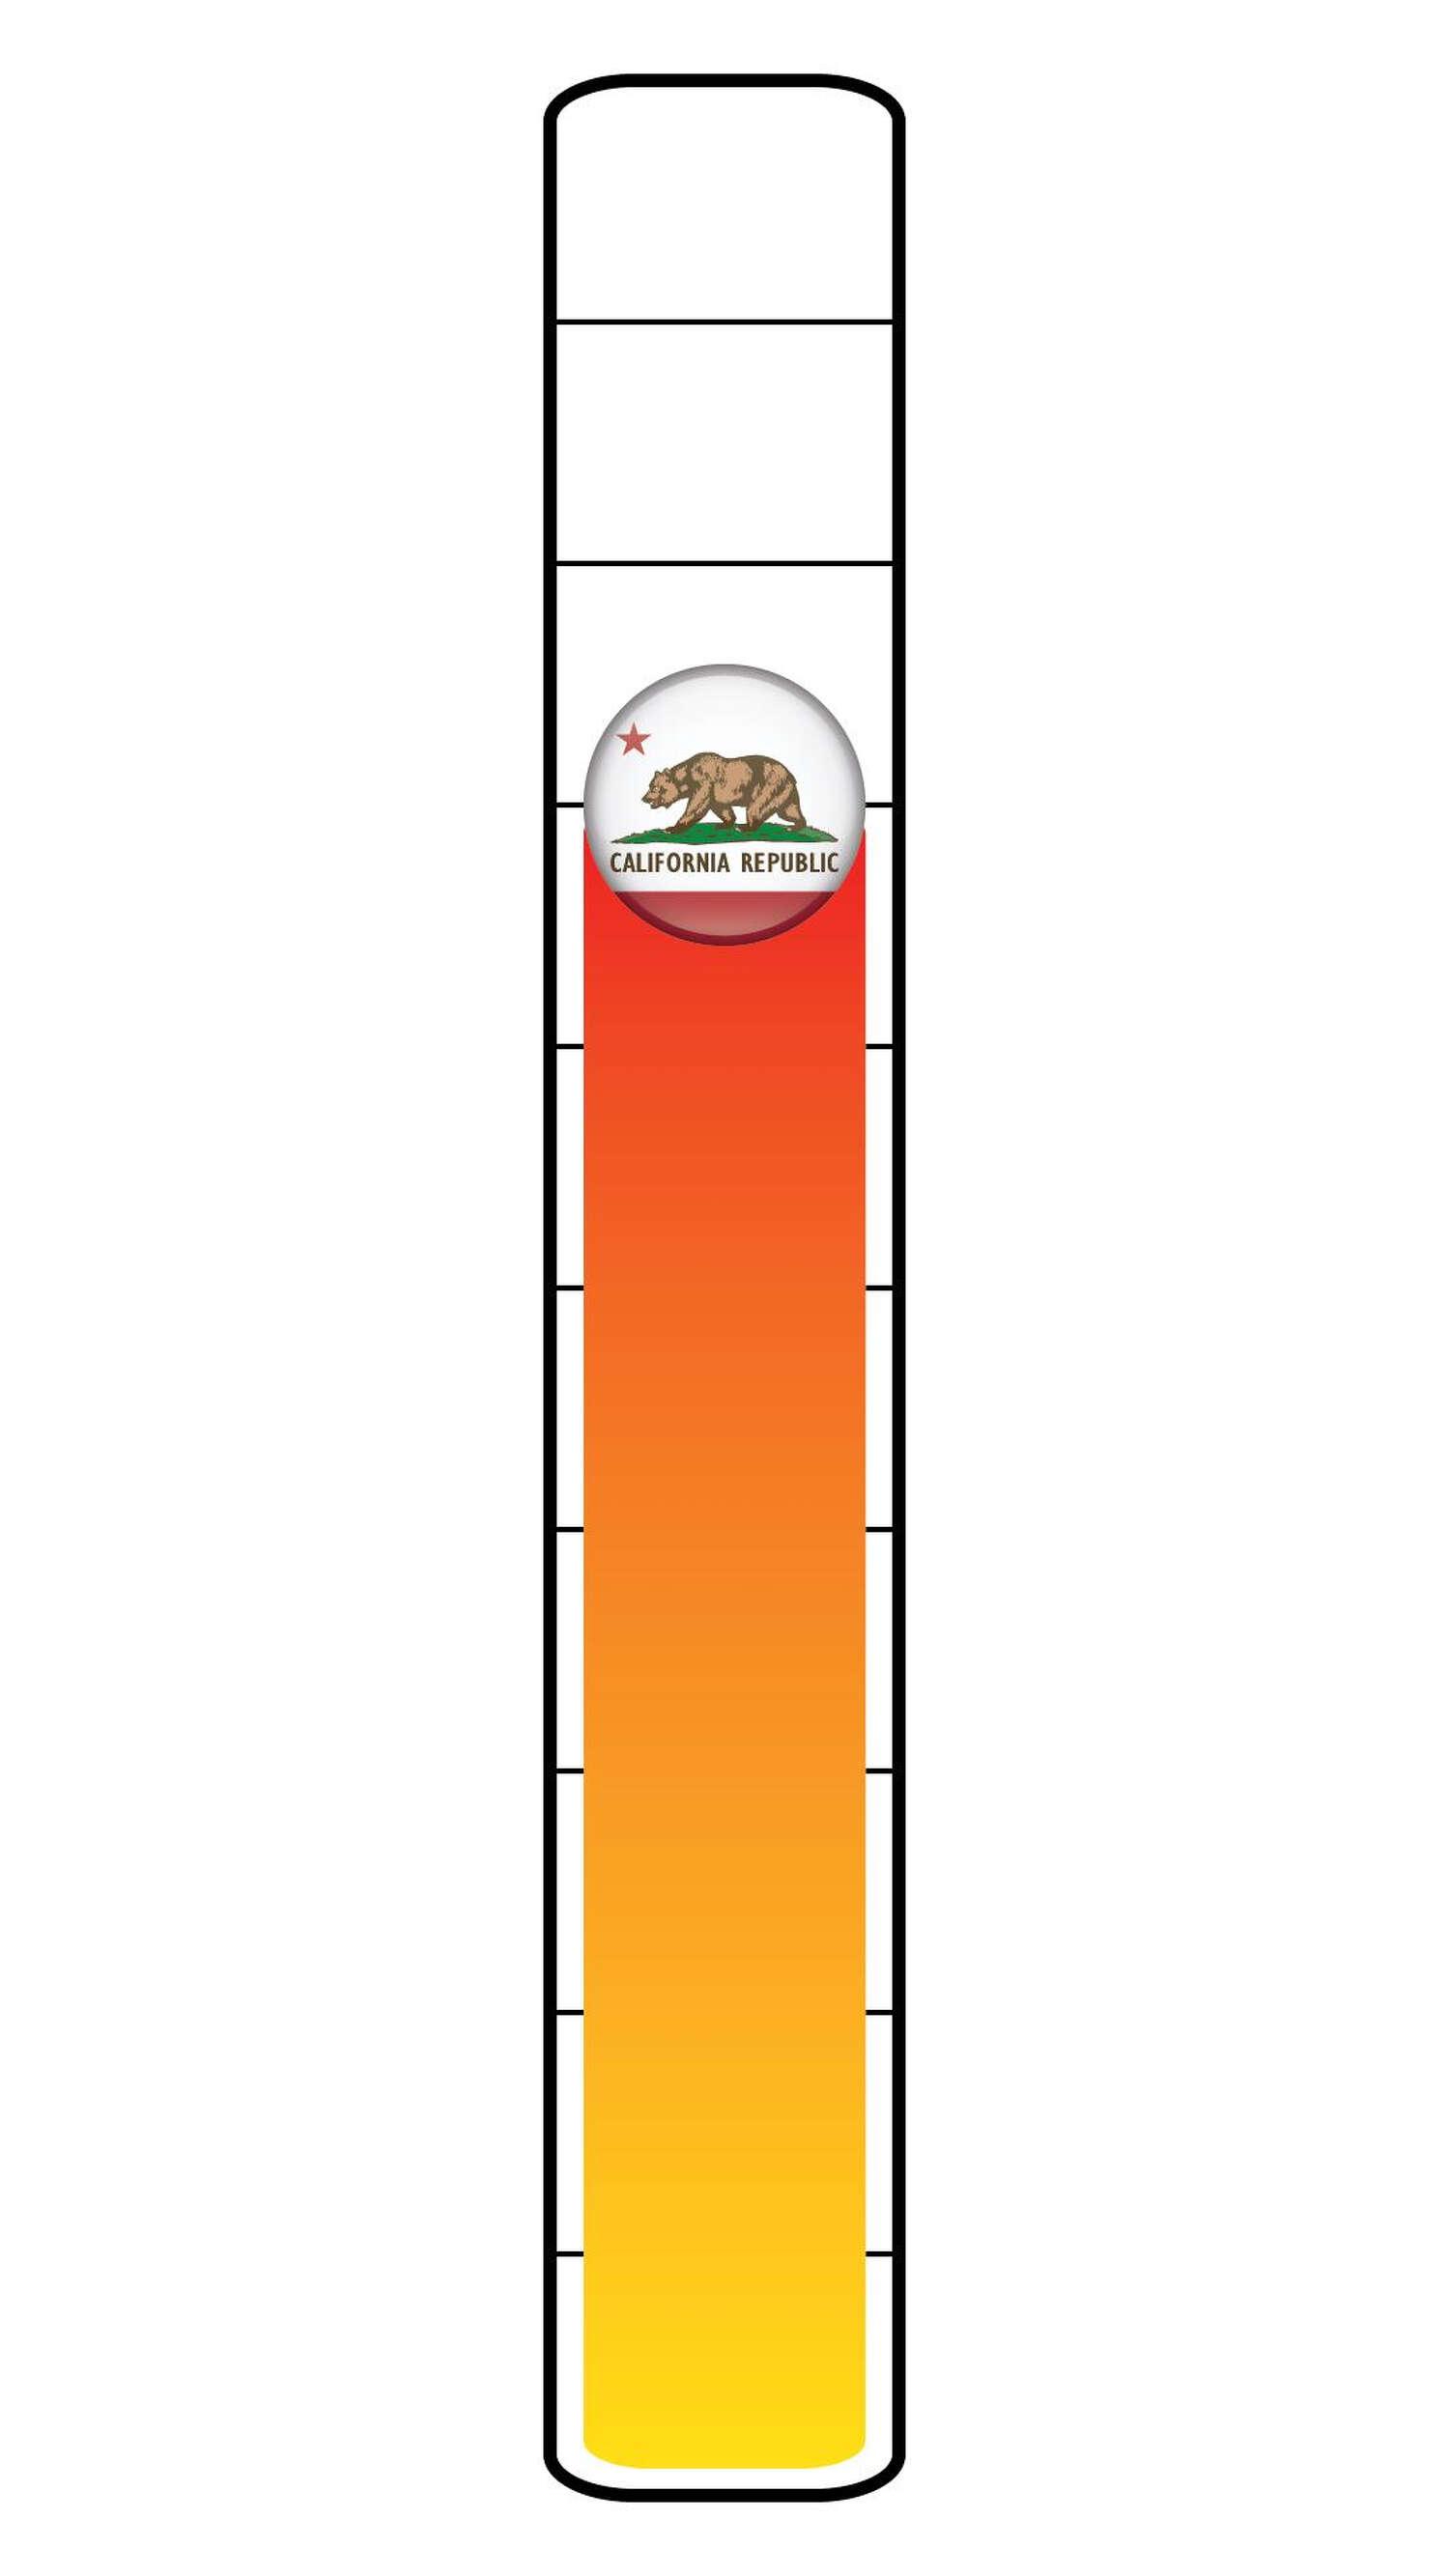 Meter: 7/10. California state flag icon.